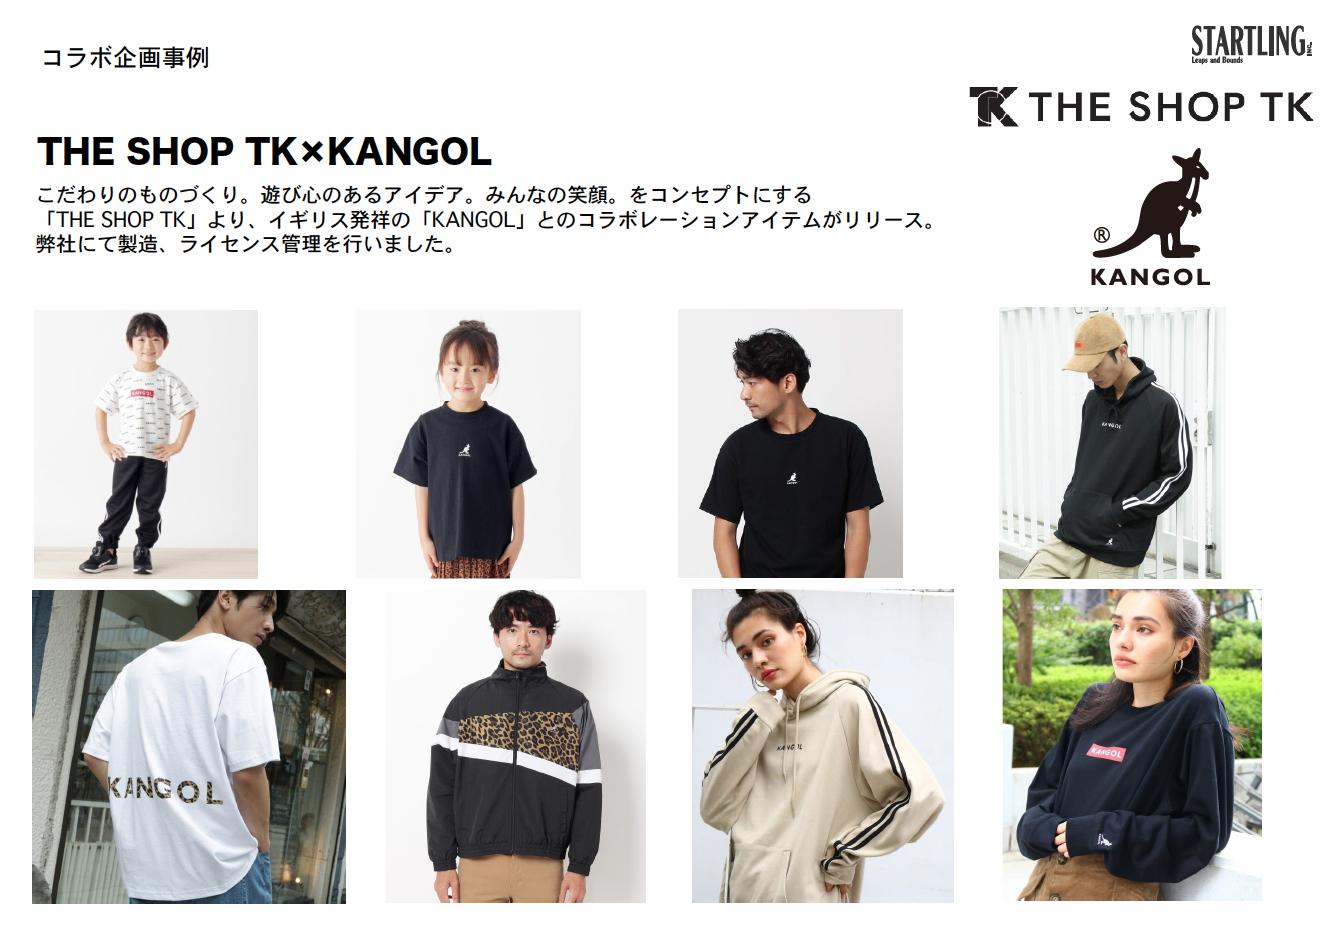 THE SHOP TK×KANGOL